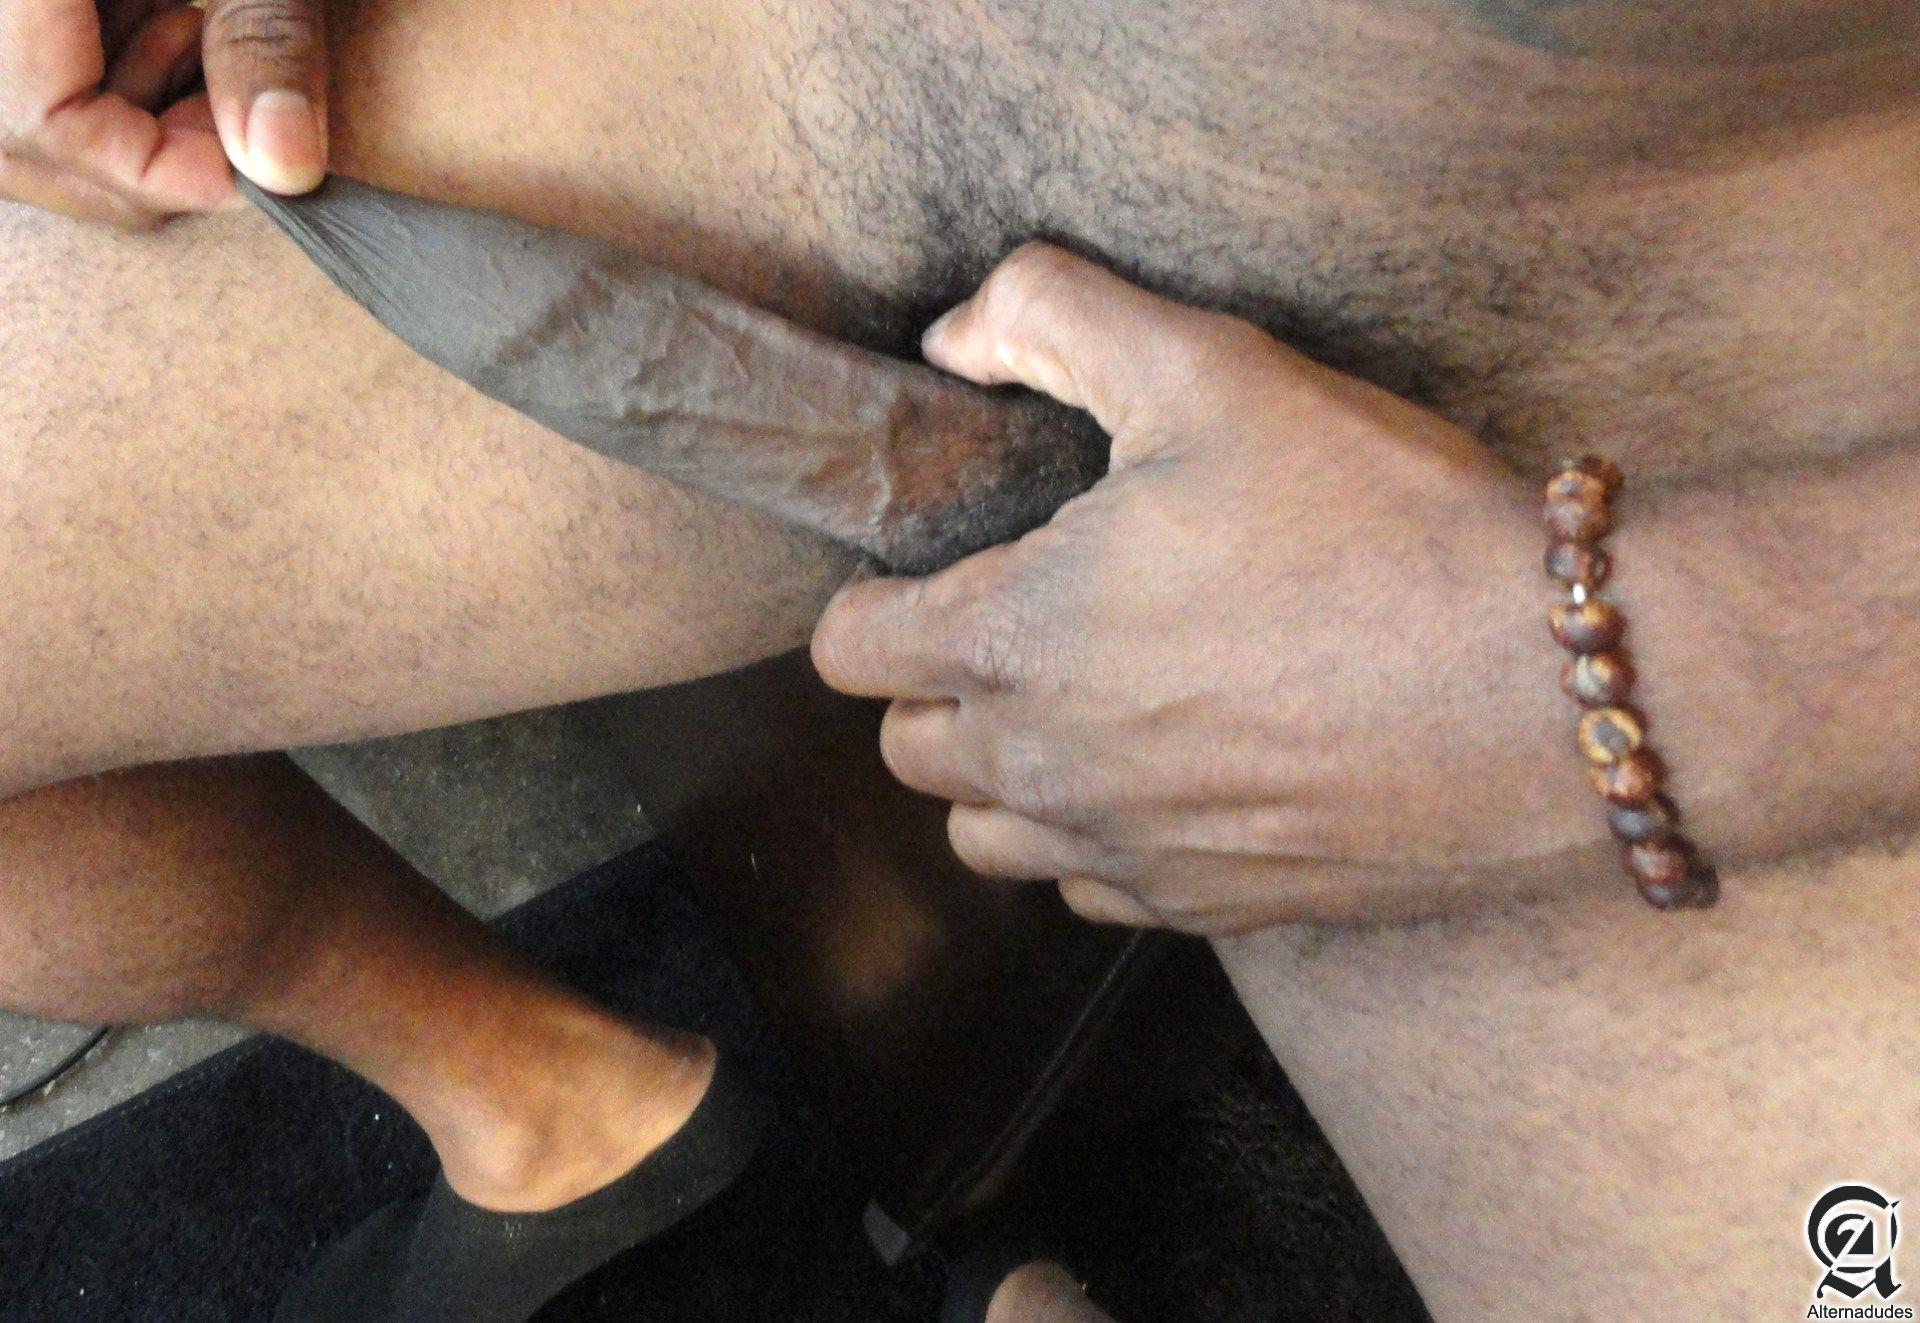 Alternadudes Kamrun big black uncut cock with cum 05 Sexy Amateur Black Hipster with a Huge Uncut Black Cock Shoots A Load